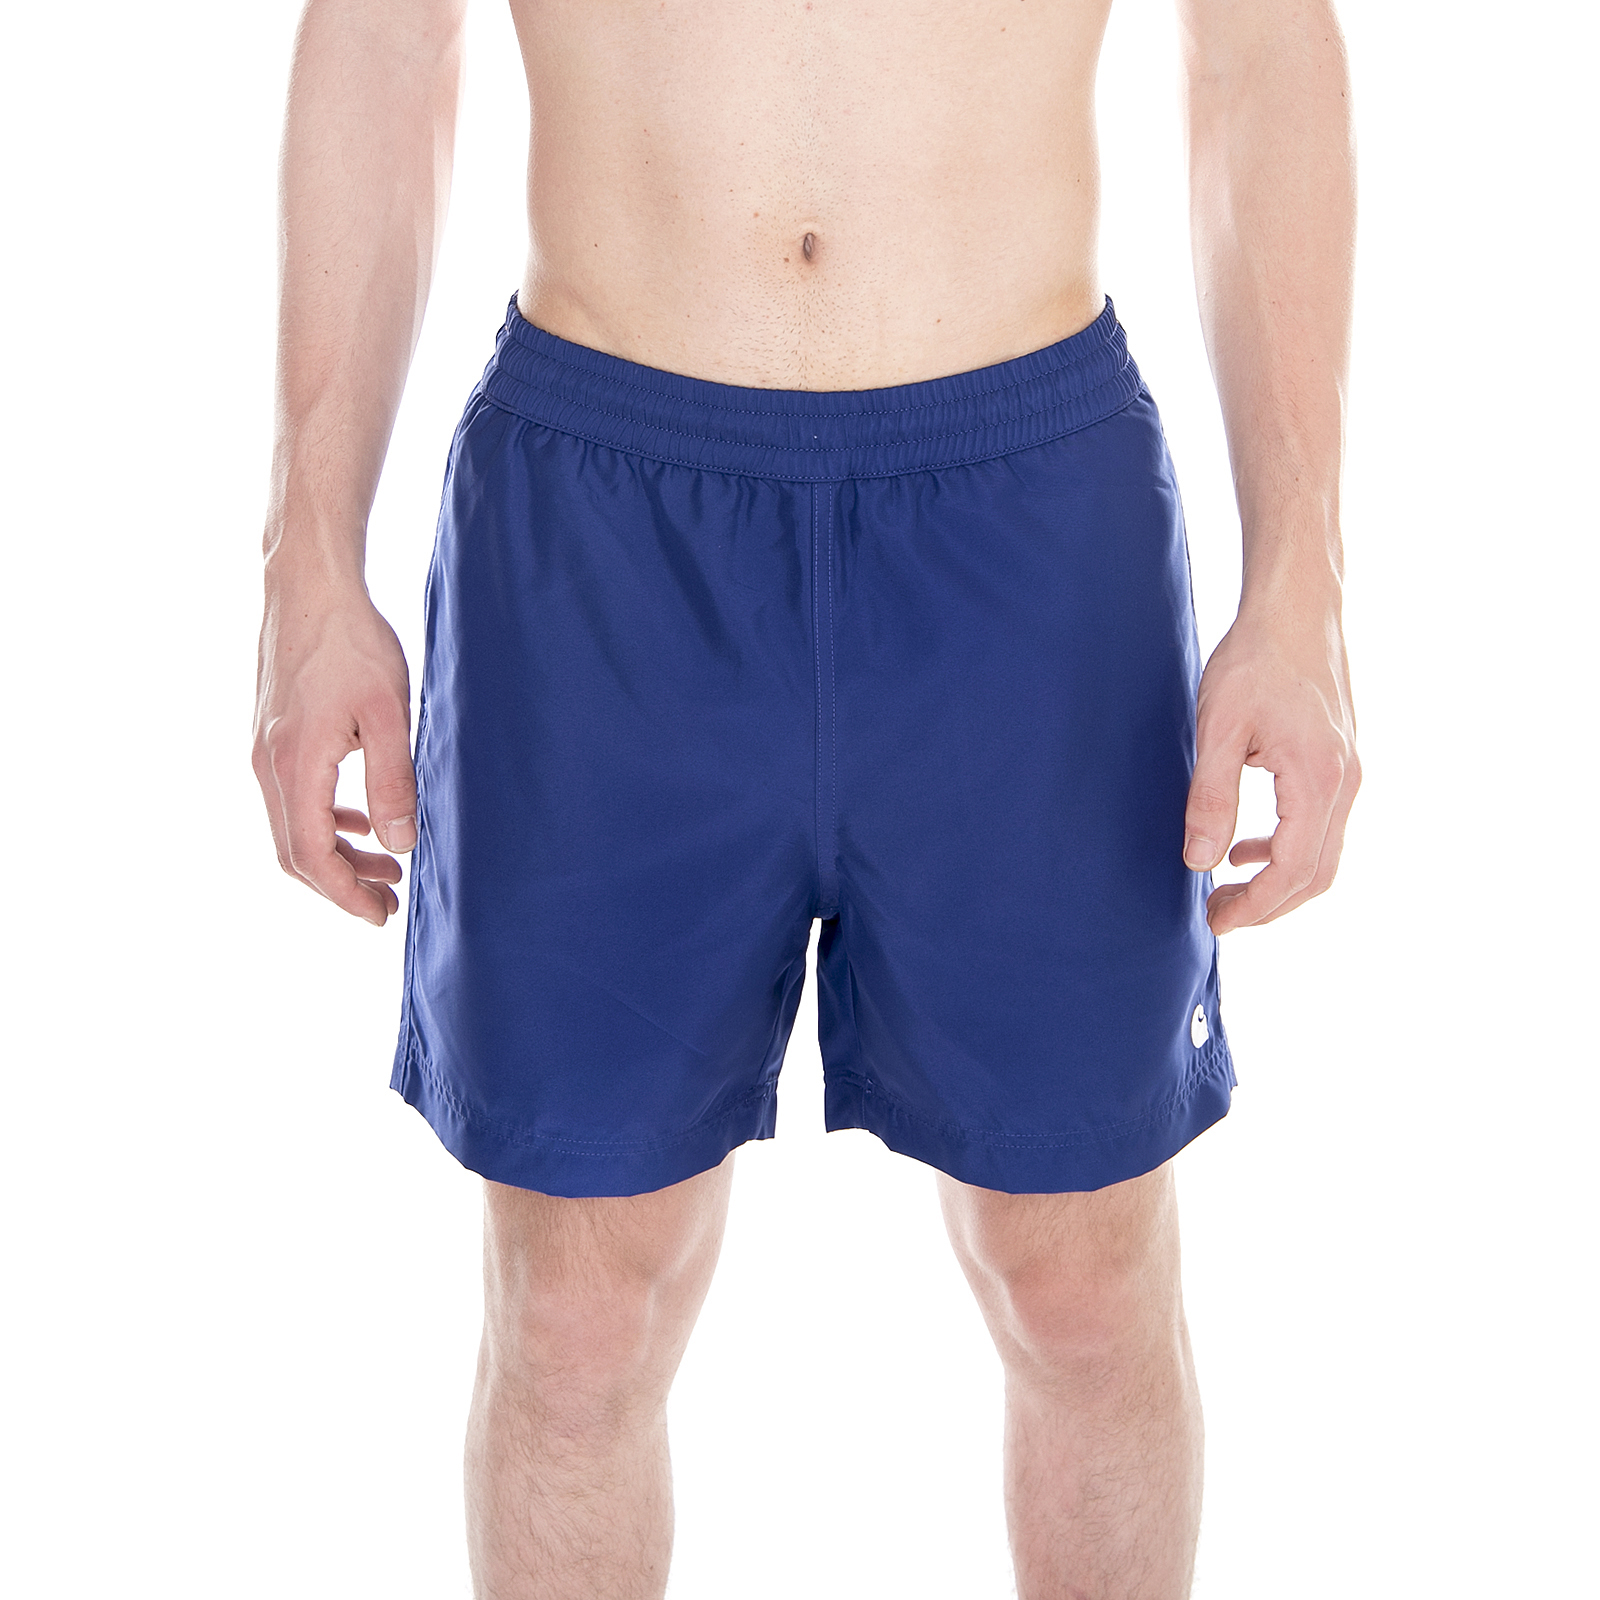 Carhartt Beachwear Cay Swim Trunk Sapphire / White Blue